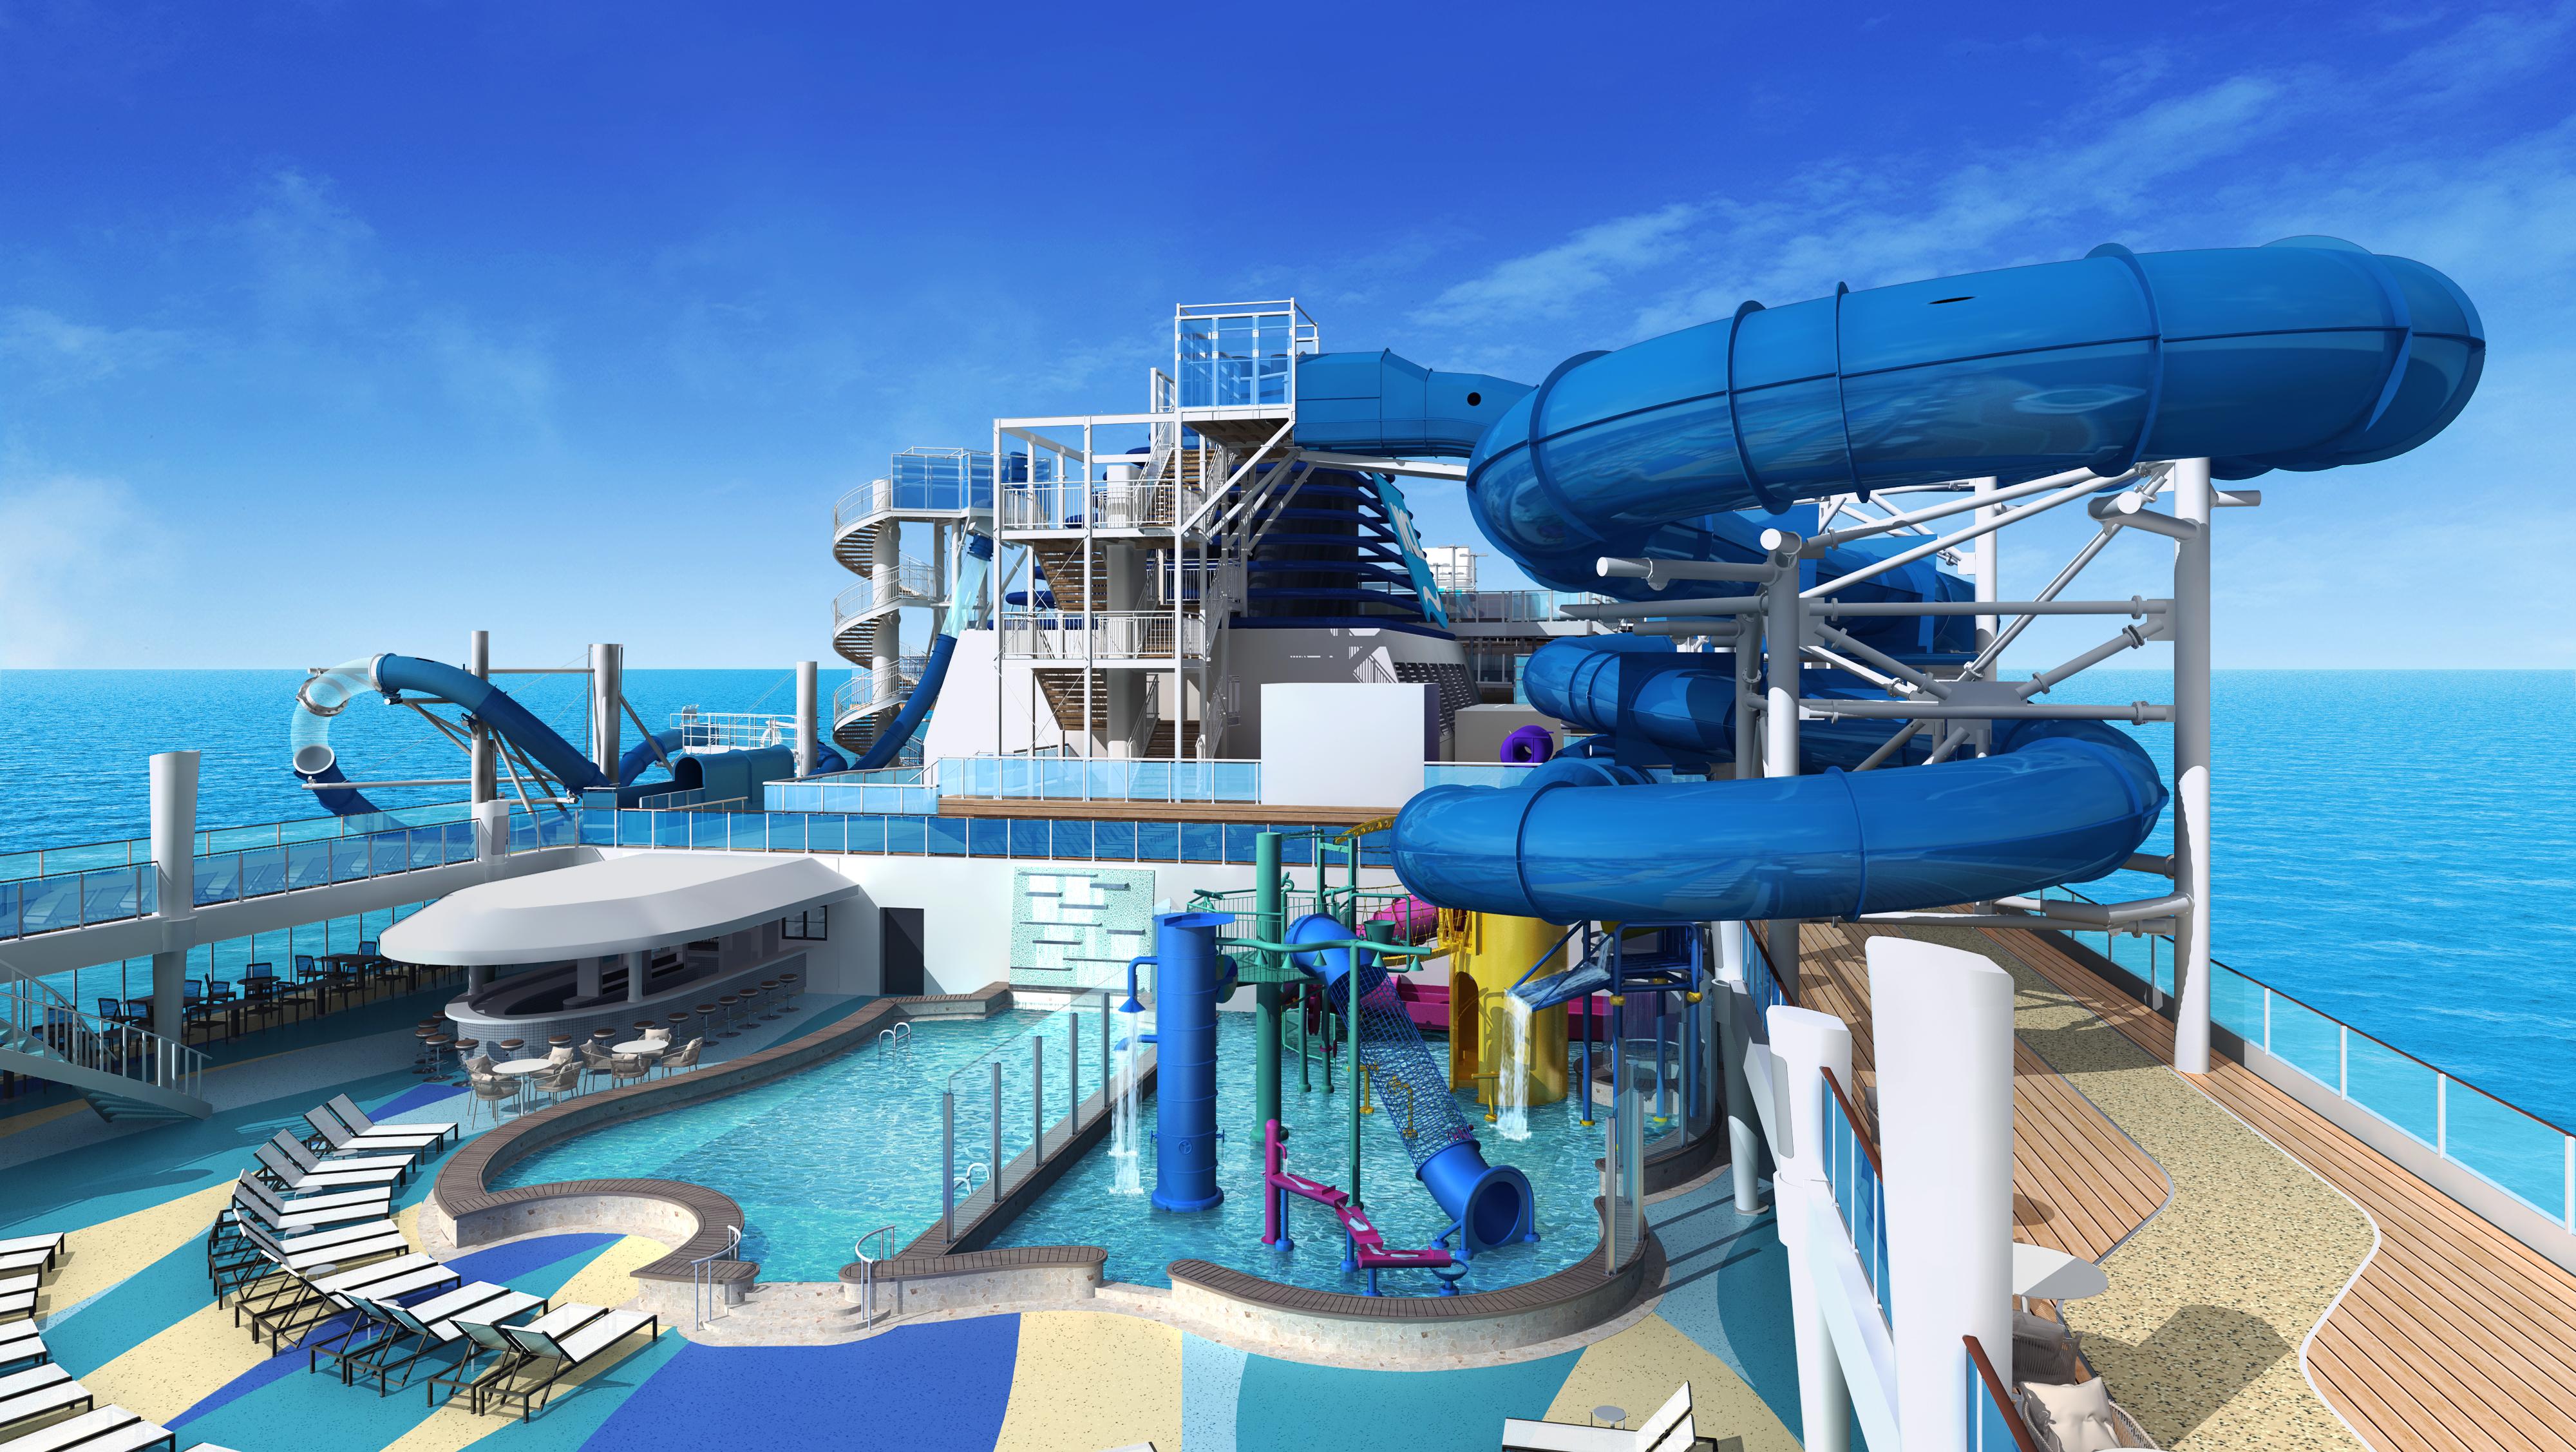 Norwegian Encore - Aqua Park Rendering